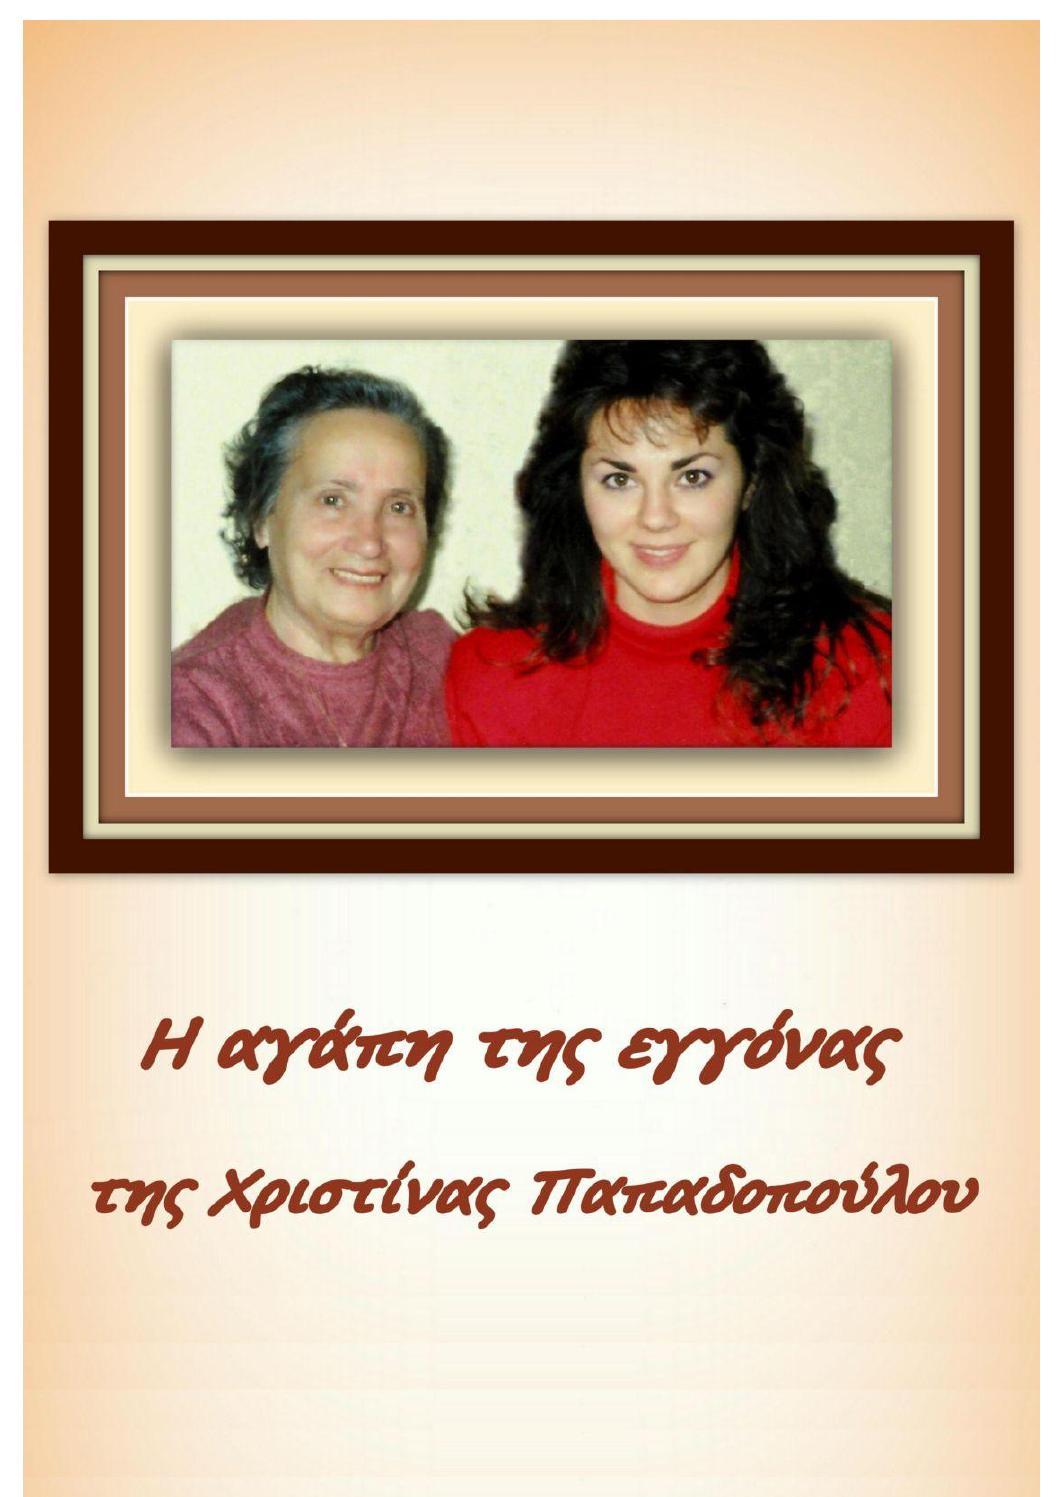 37712d993242 Η ΑΓΑΠΗ ΤΗΣ ΕΓΓΟΝΑΣ by Christina Papadopoulou - issuu